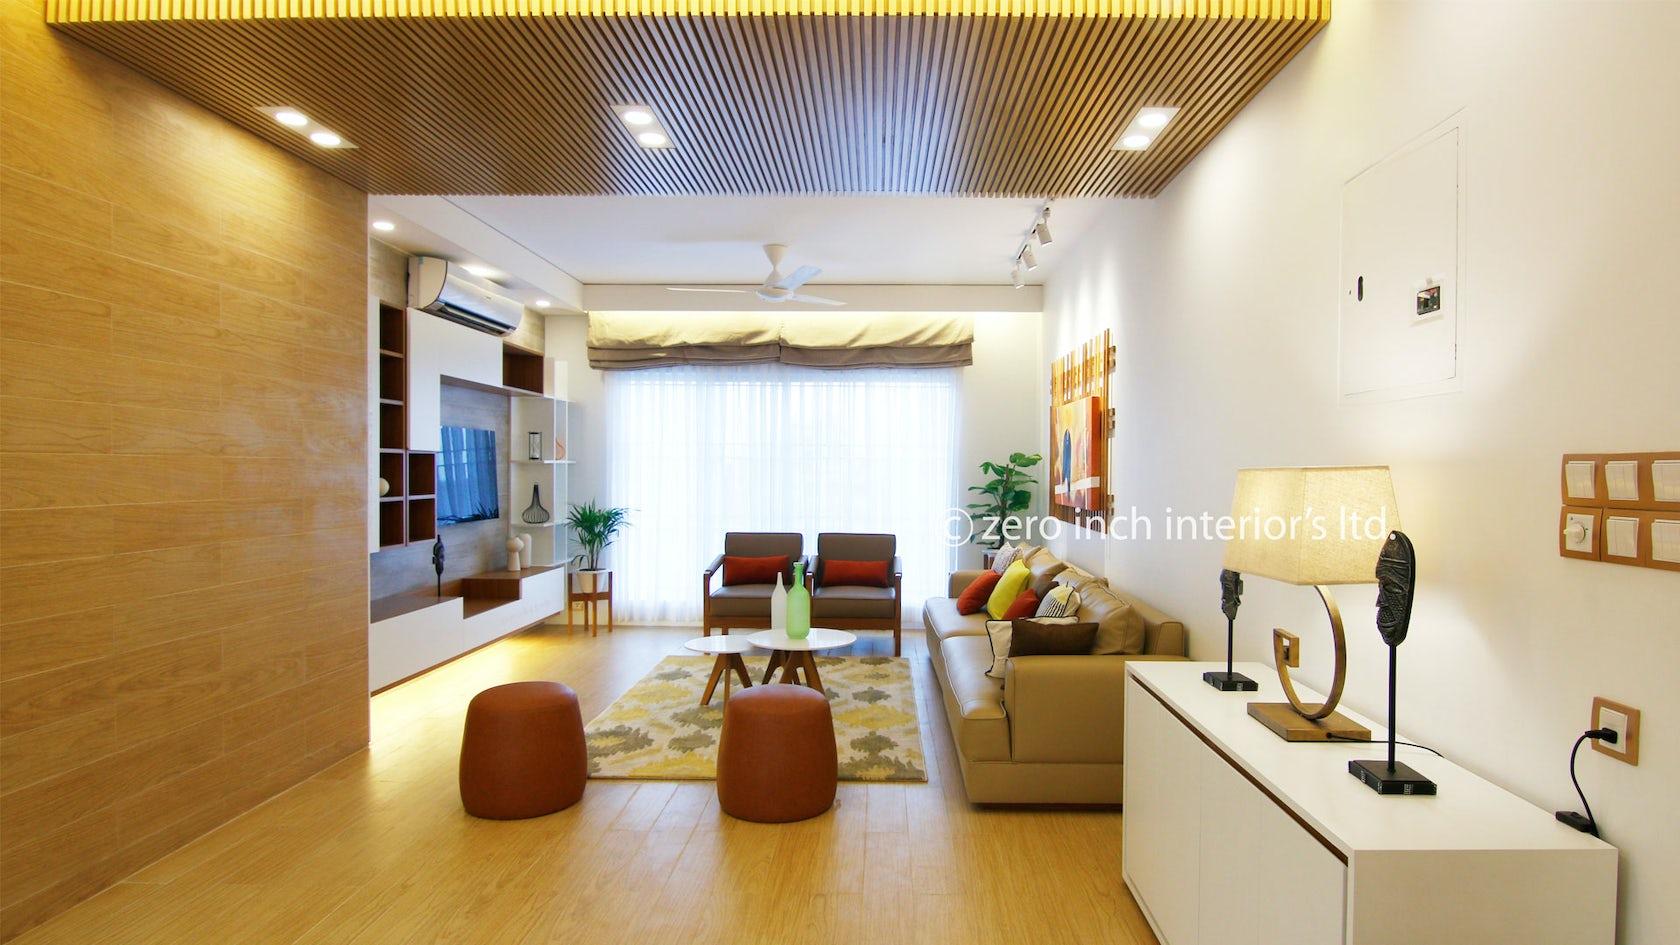 Bangladeshi Interior Design Room Decorating Living Room Interior Design Company In Bangladesh